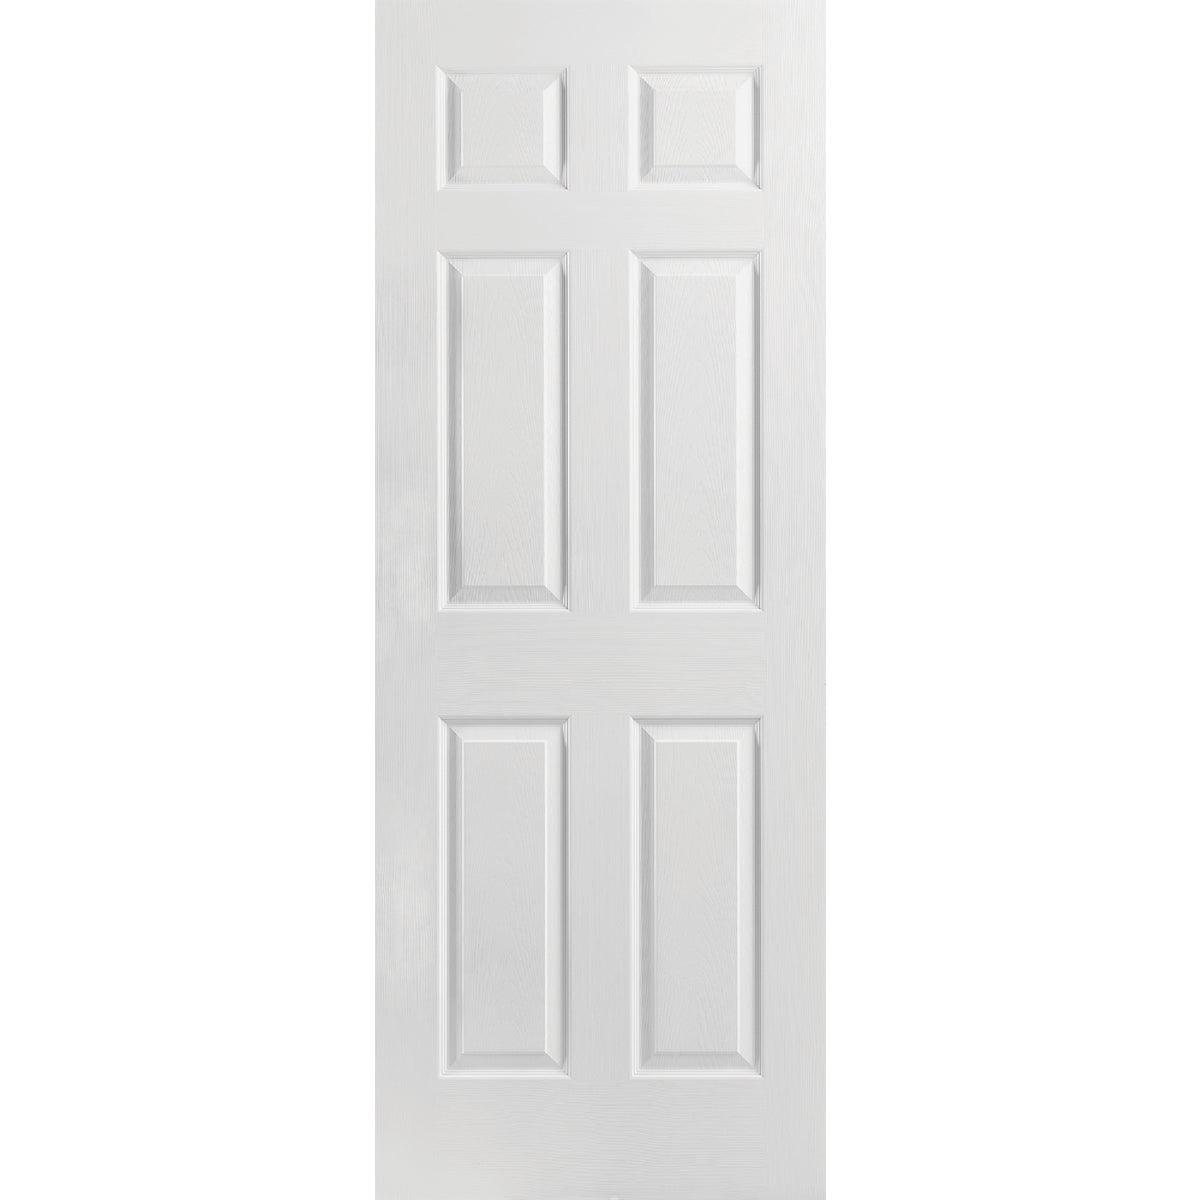 Masonite 2/8 1-3/8 6PN TX HC DOOR